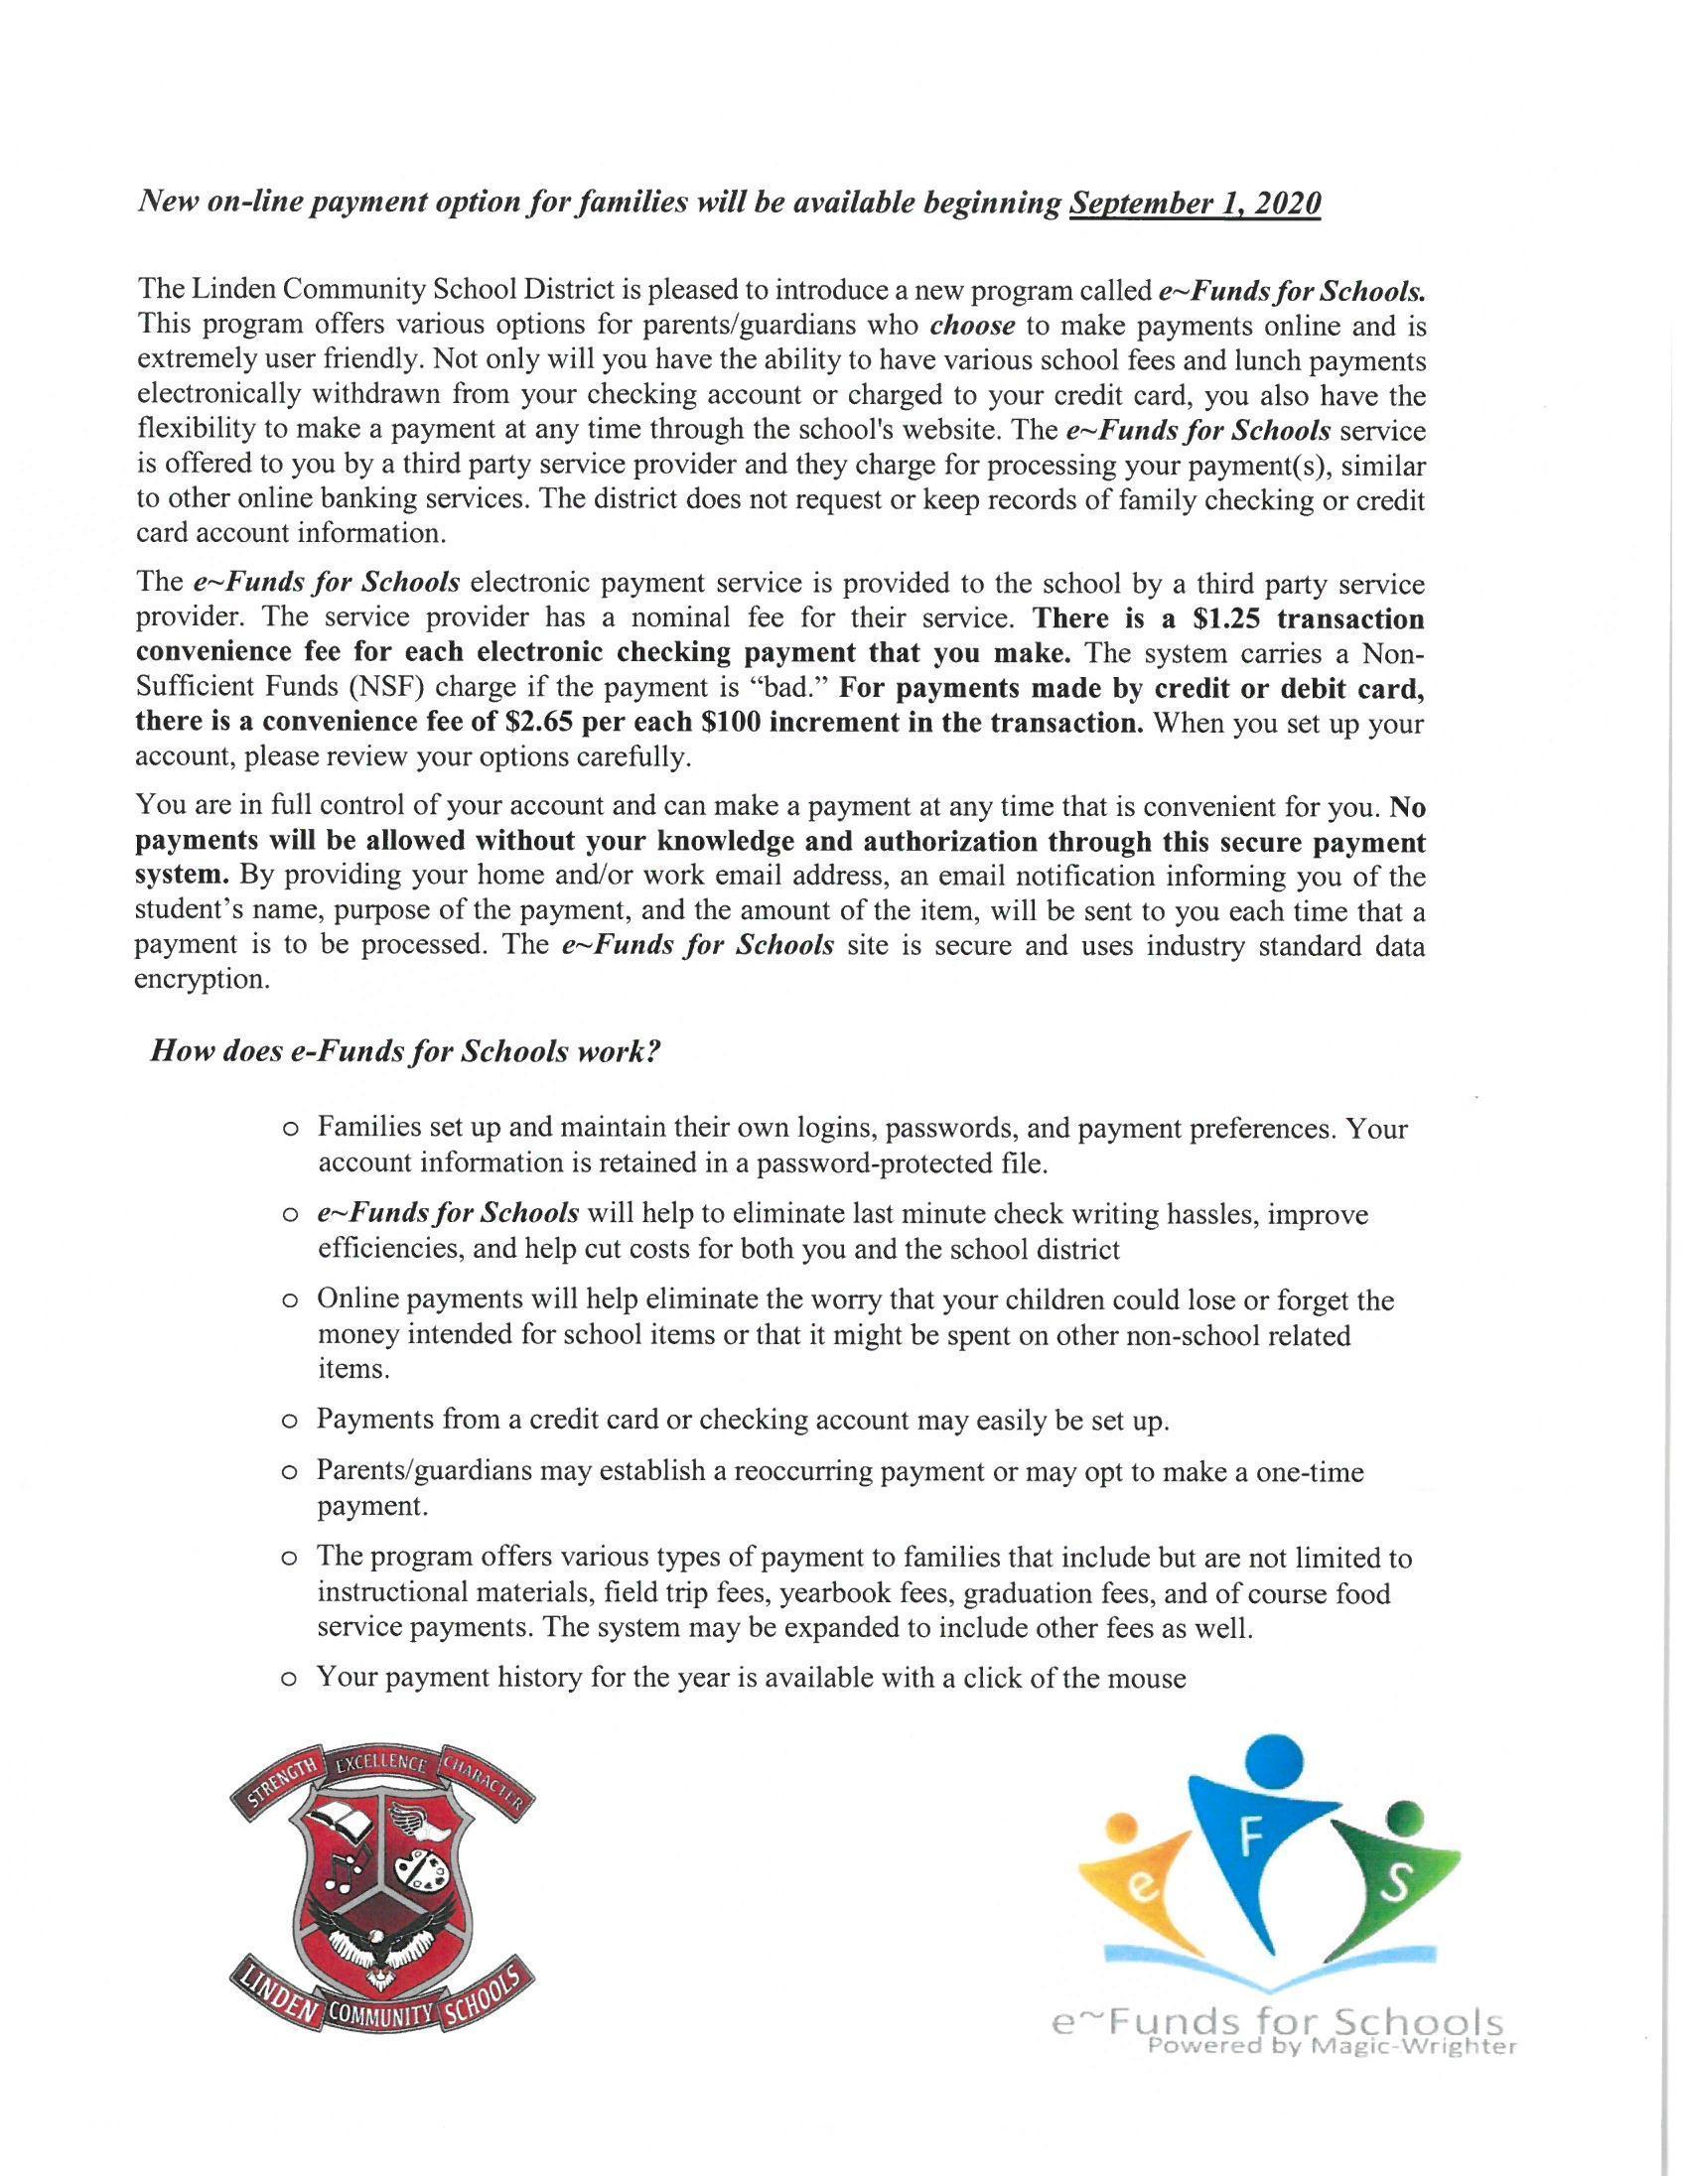 Letter describing e-Funds for Schools